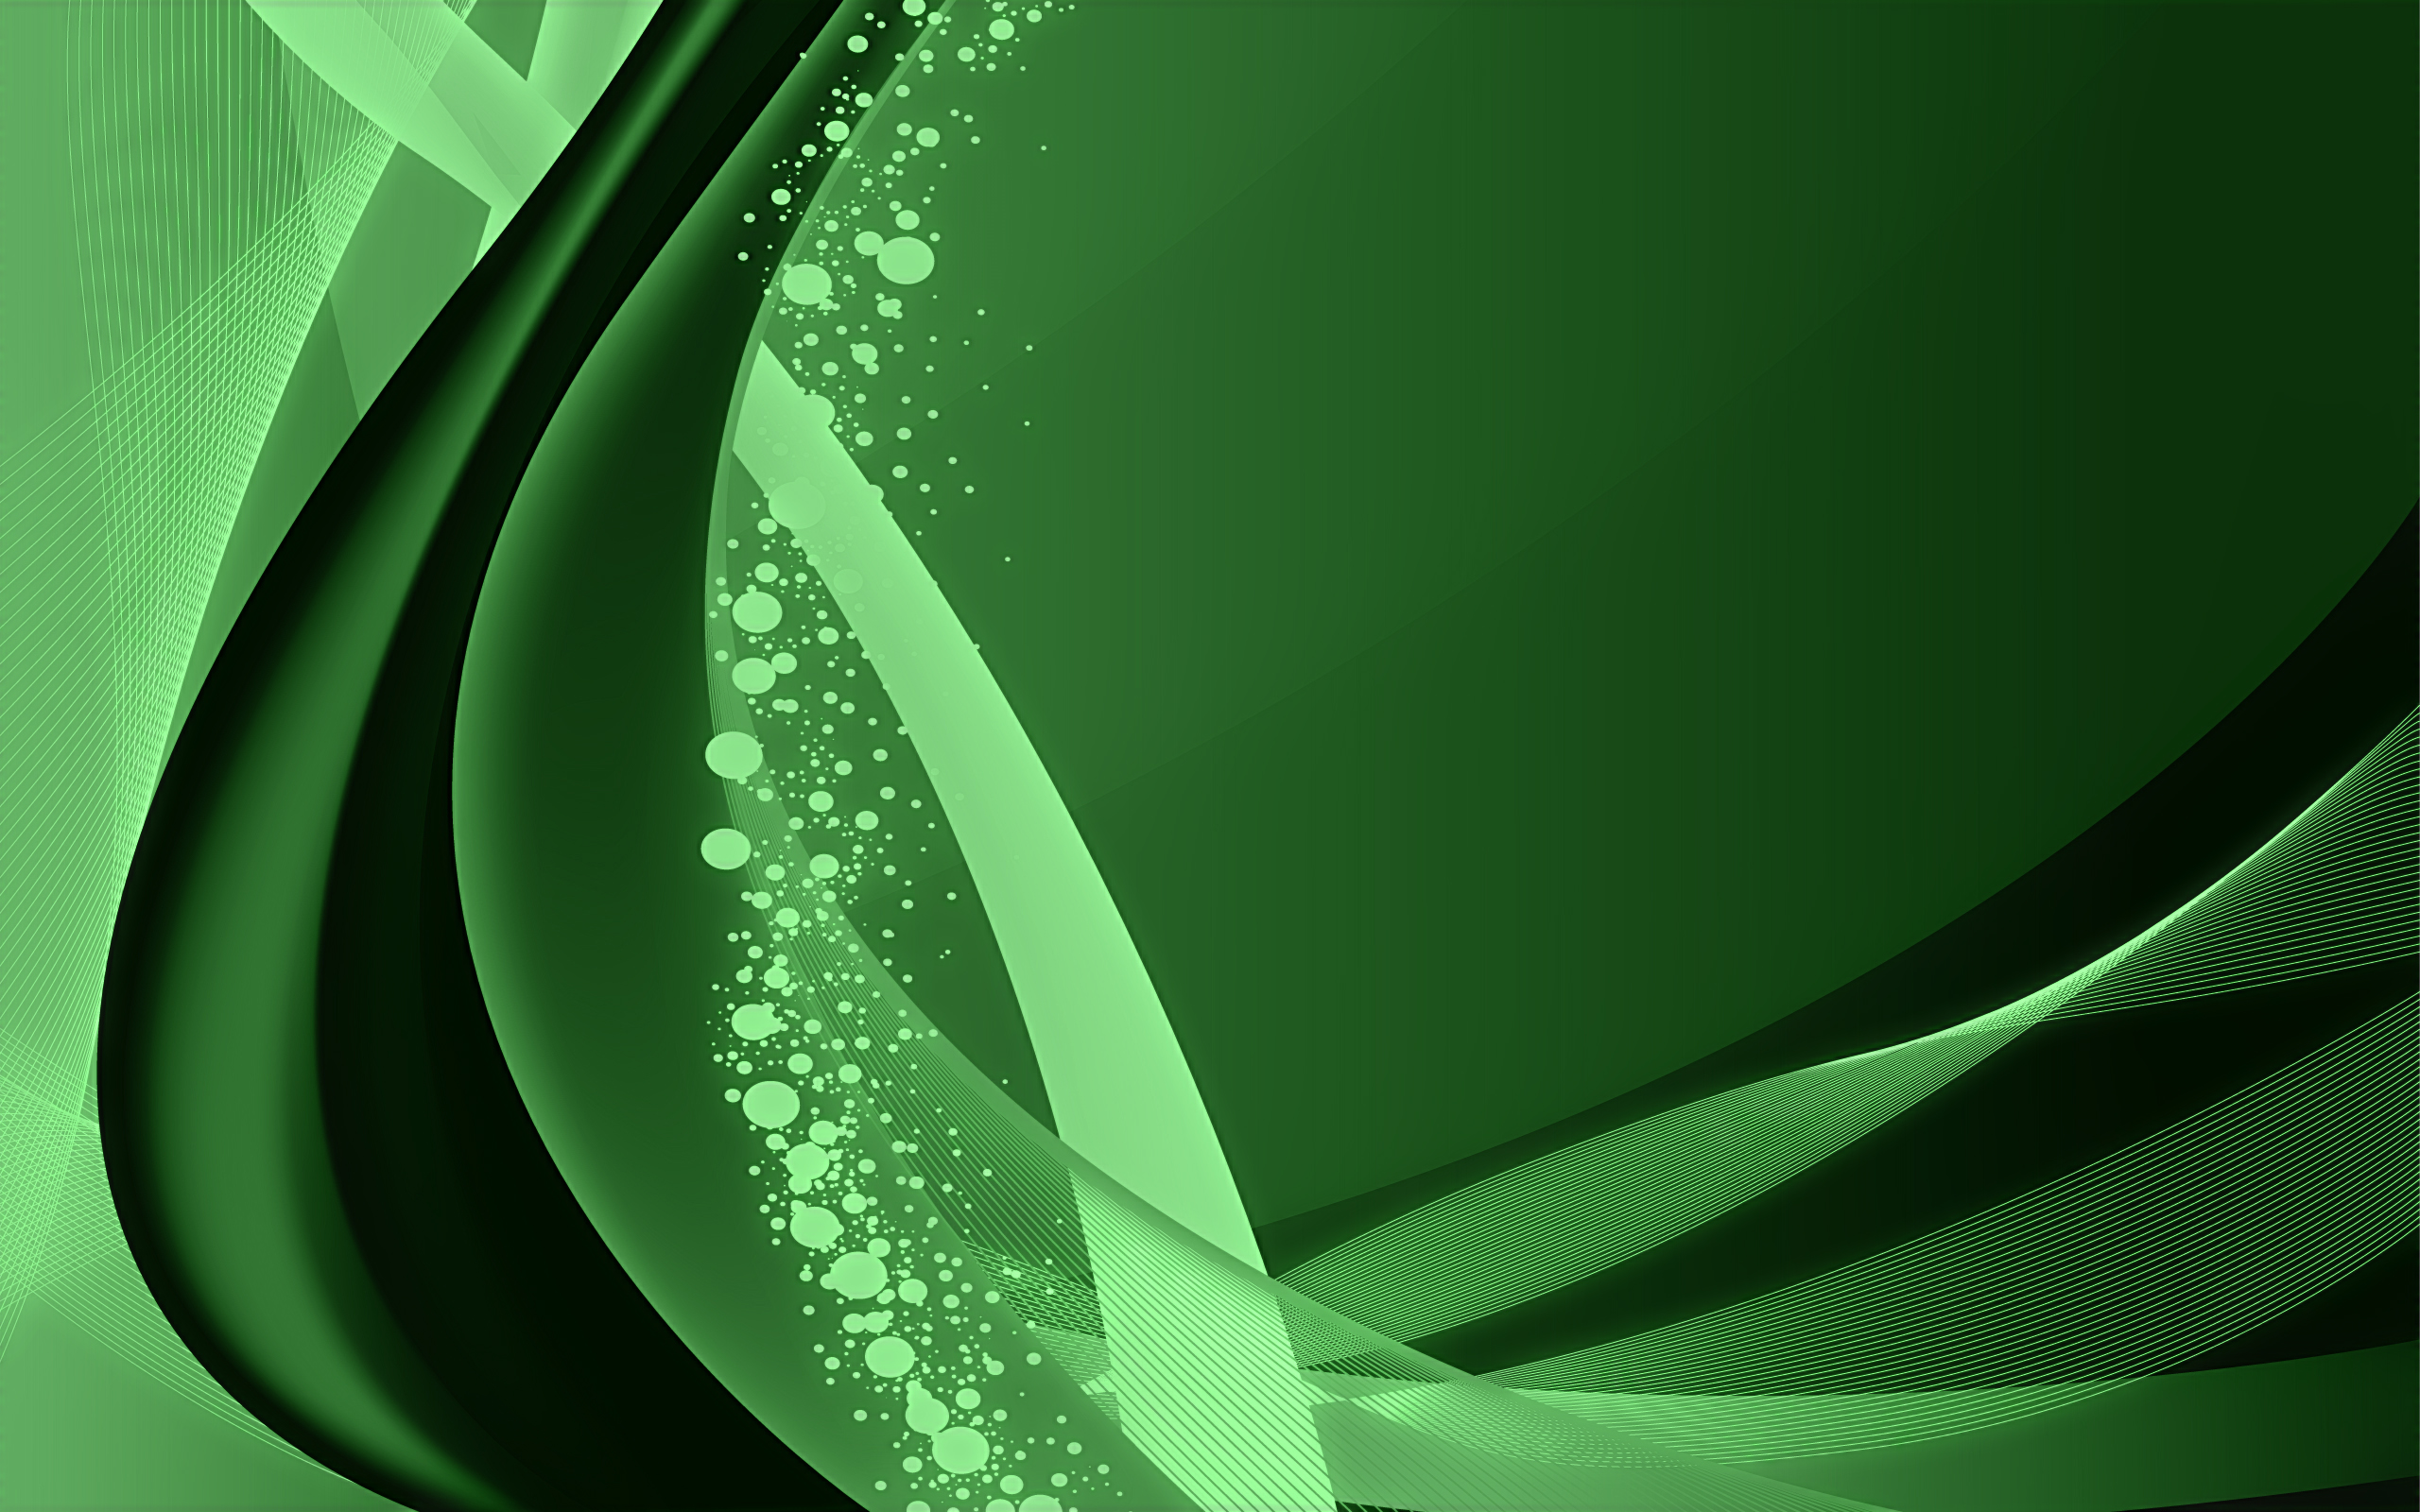 greentorsions by nucu